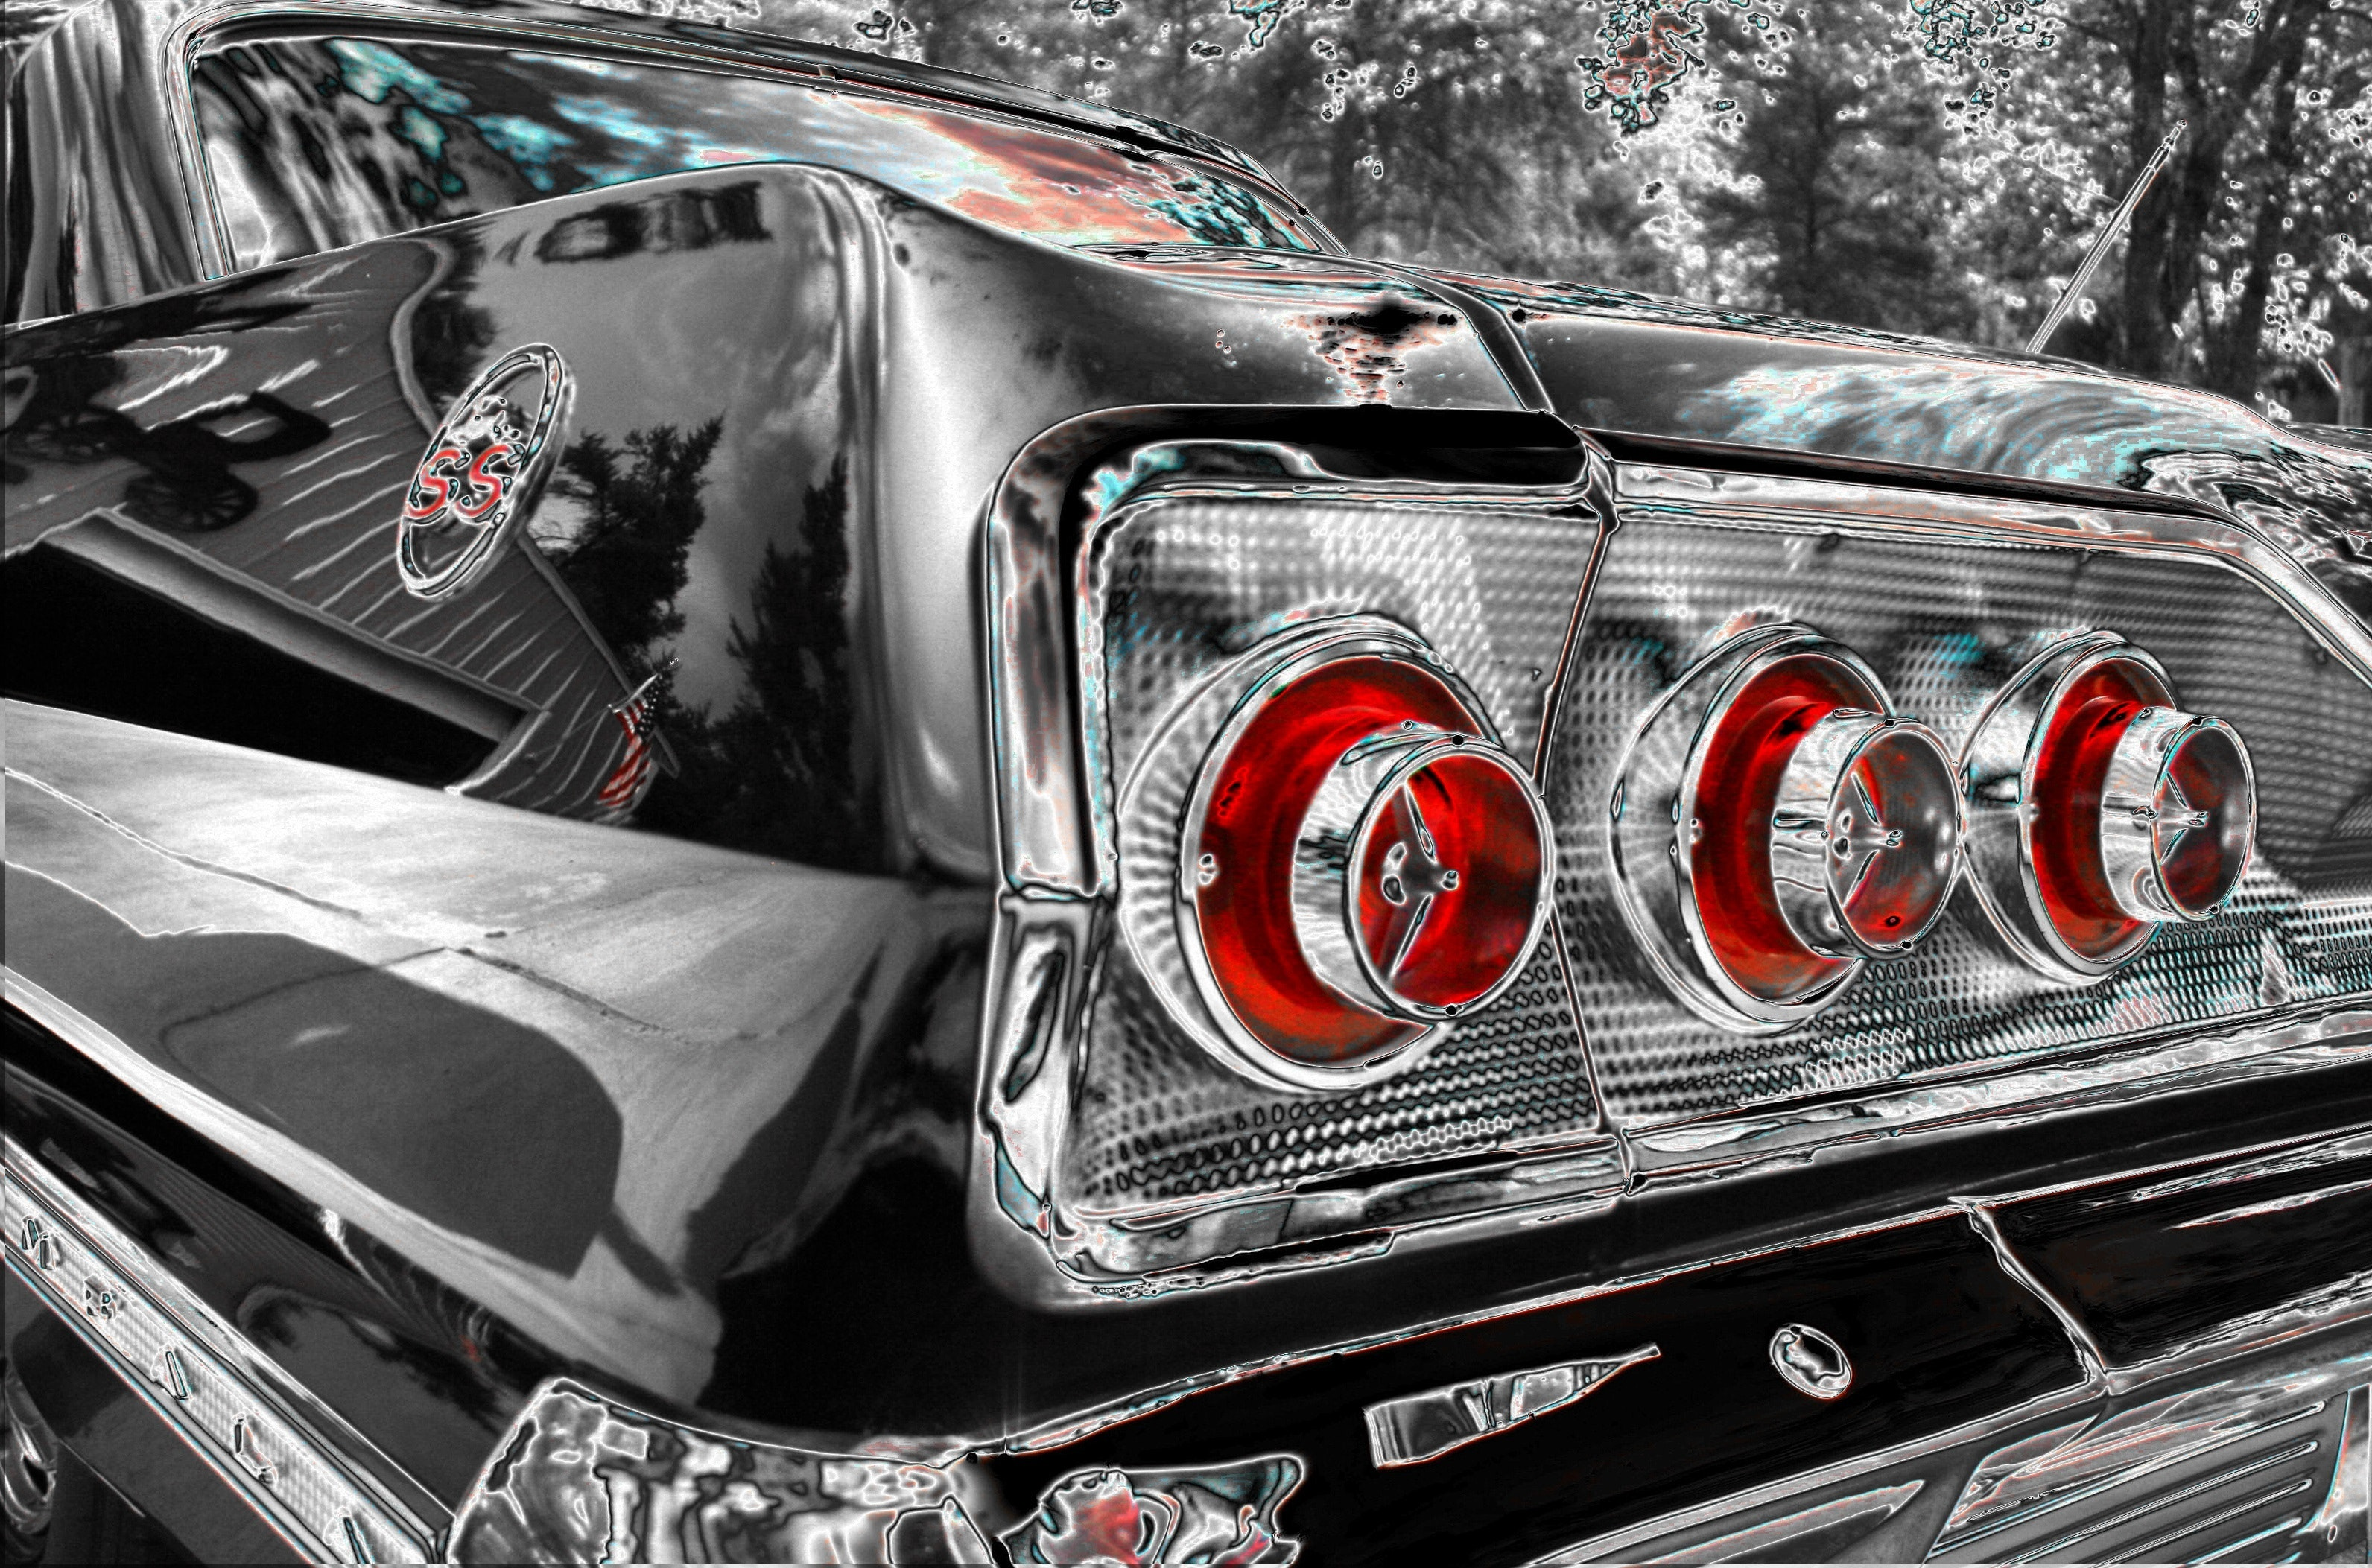 Black Vintage Car · Free Stock Photo